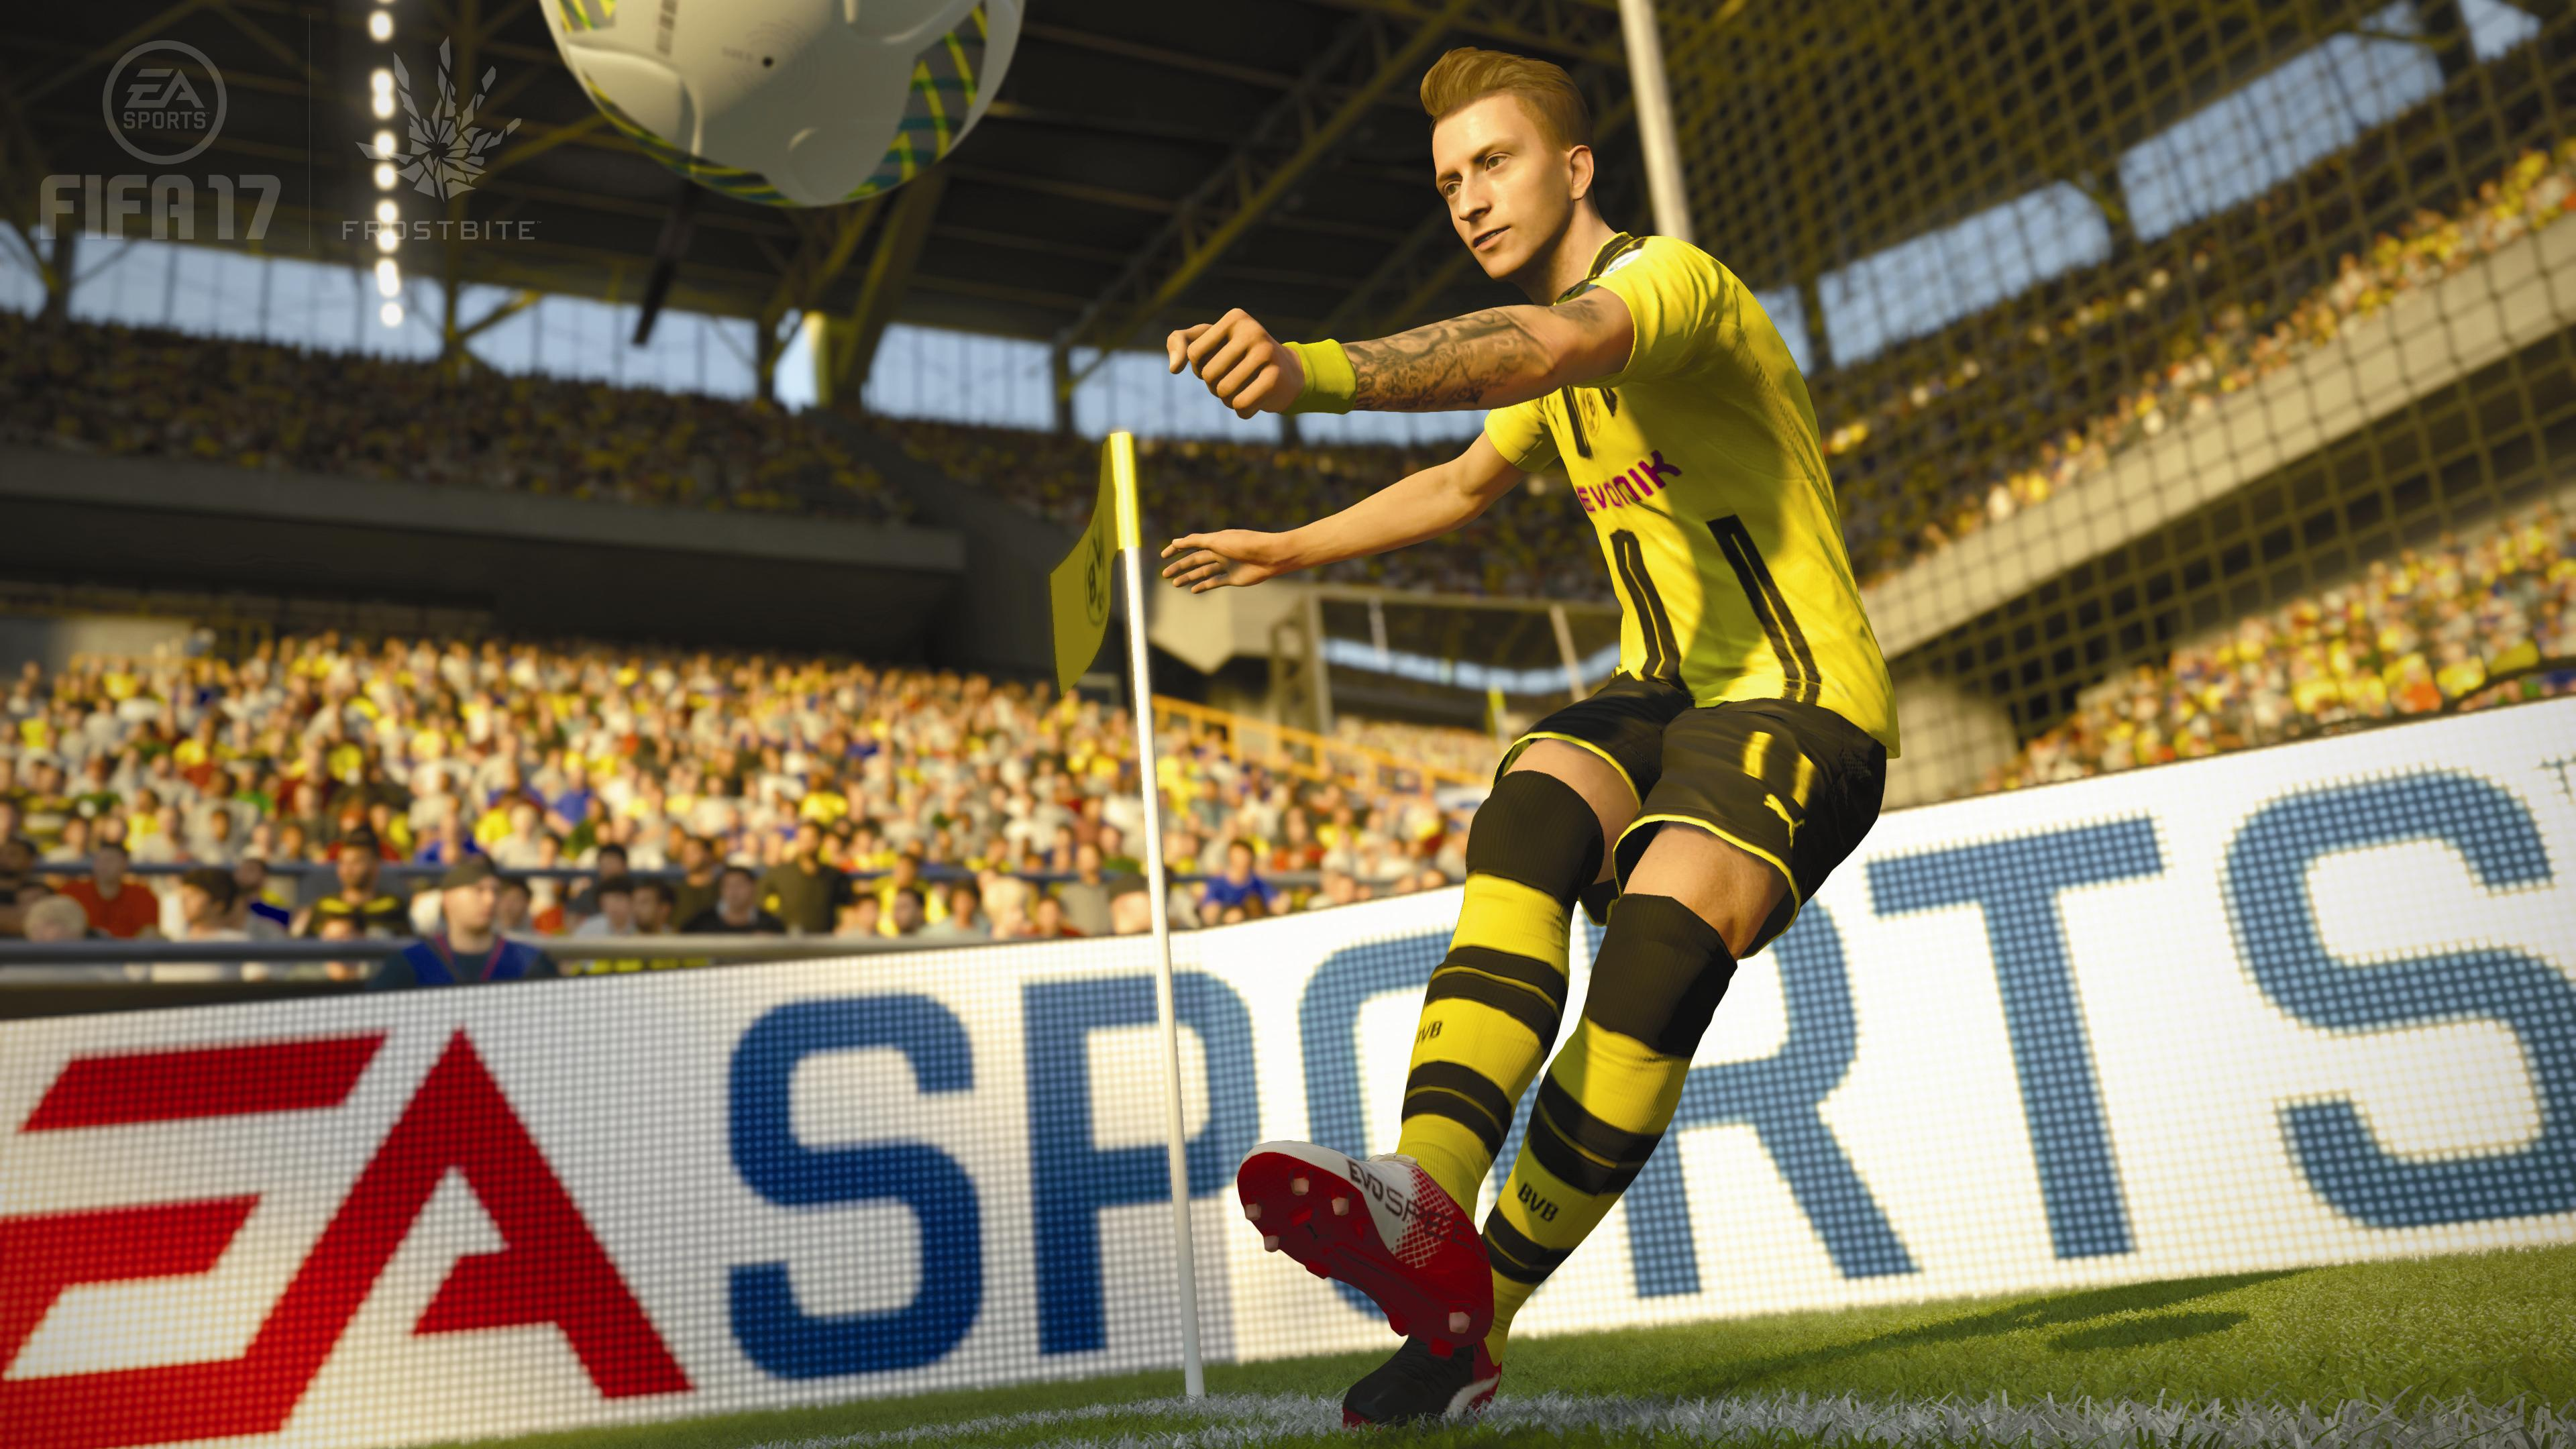 Upcoming video games: 'FIFA 17,' 'Forza Horizon 3,' 'Yo-Kai Watch 2'